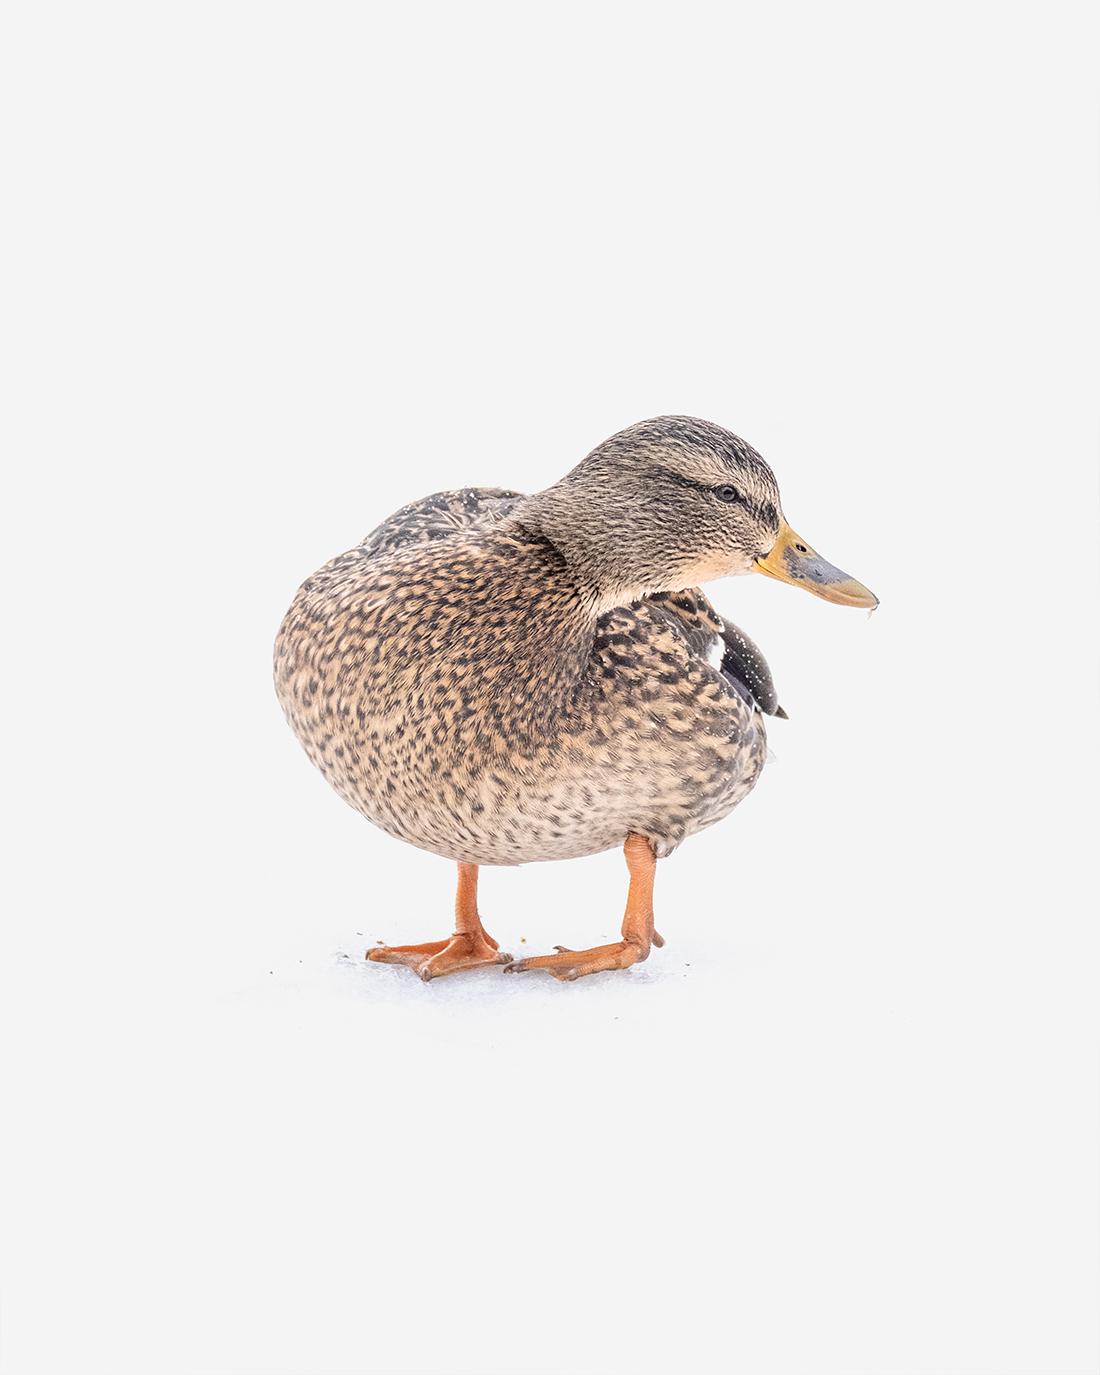 DSCF0715-1-WEB-ciliestad-female-mallard-trondheim-bird